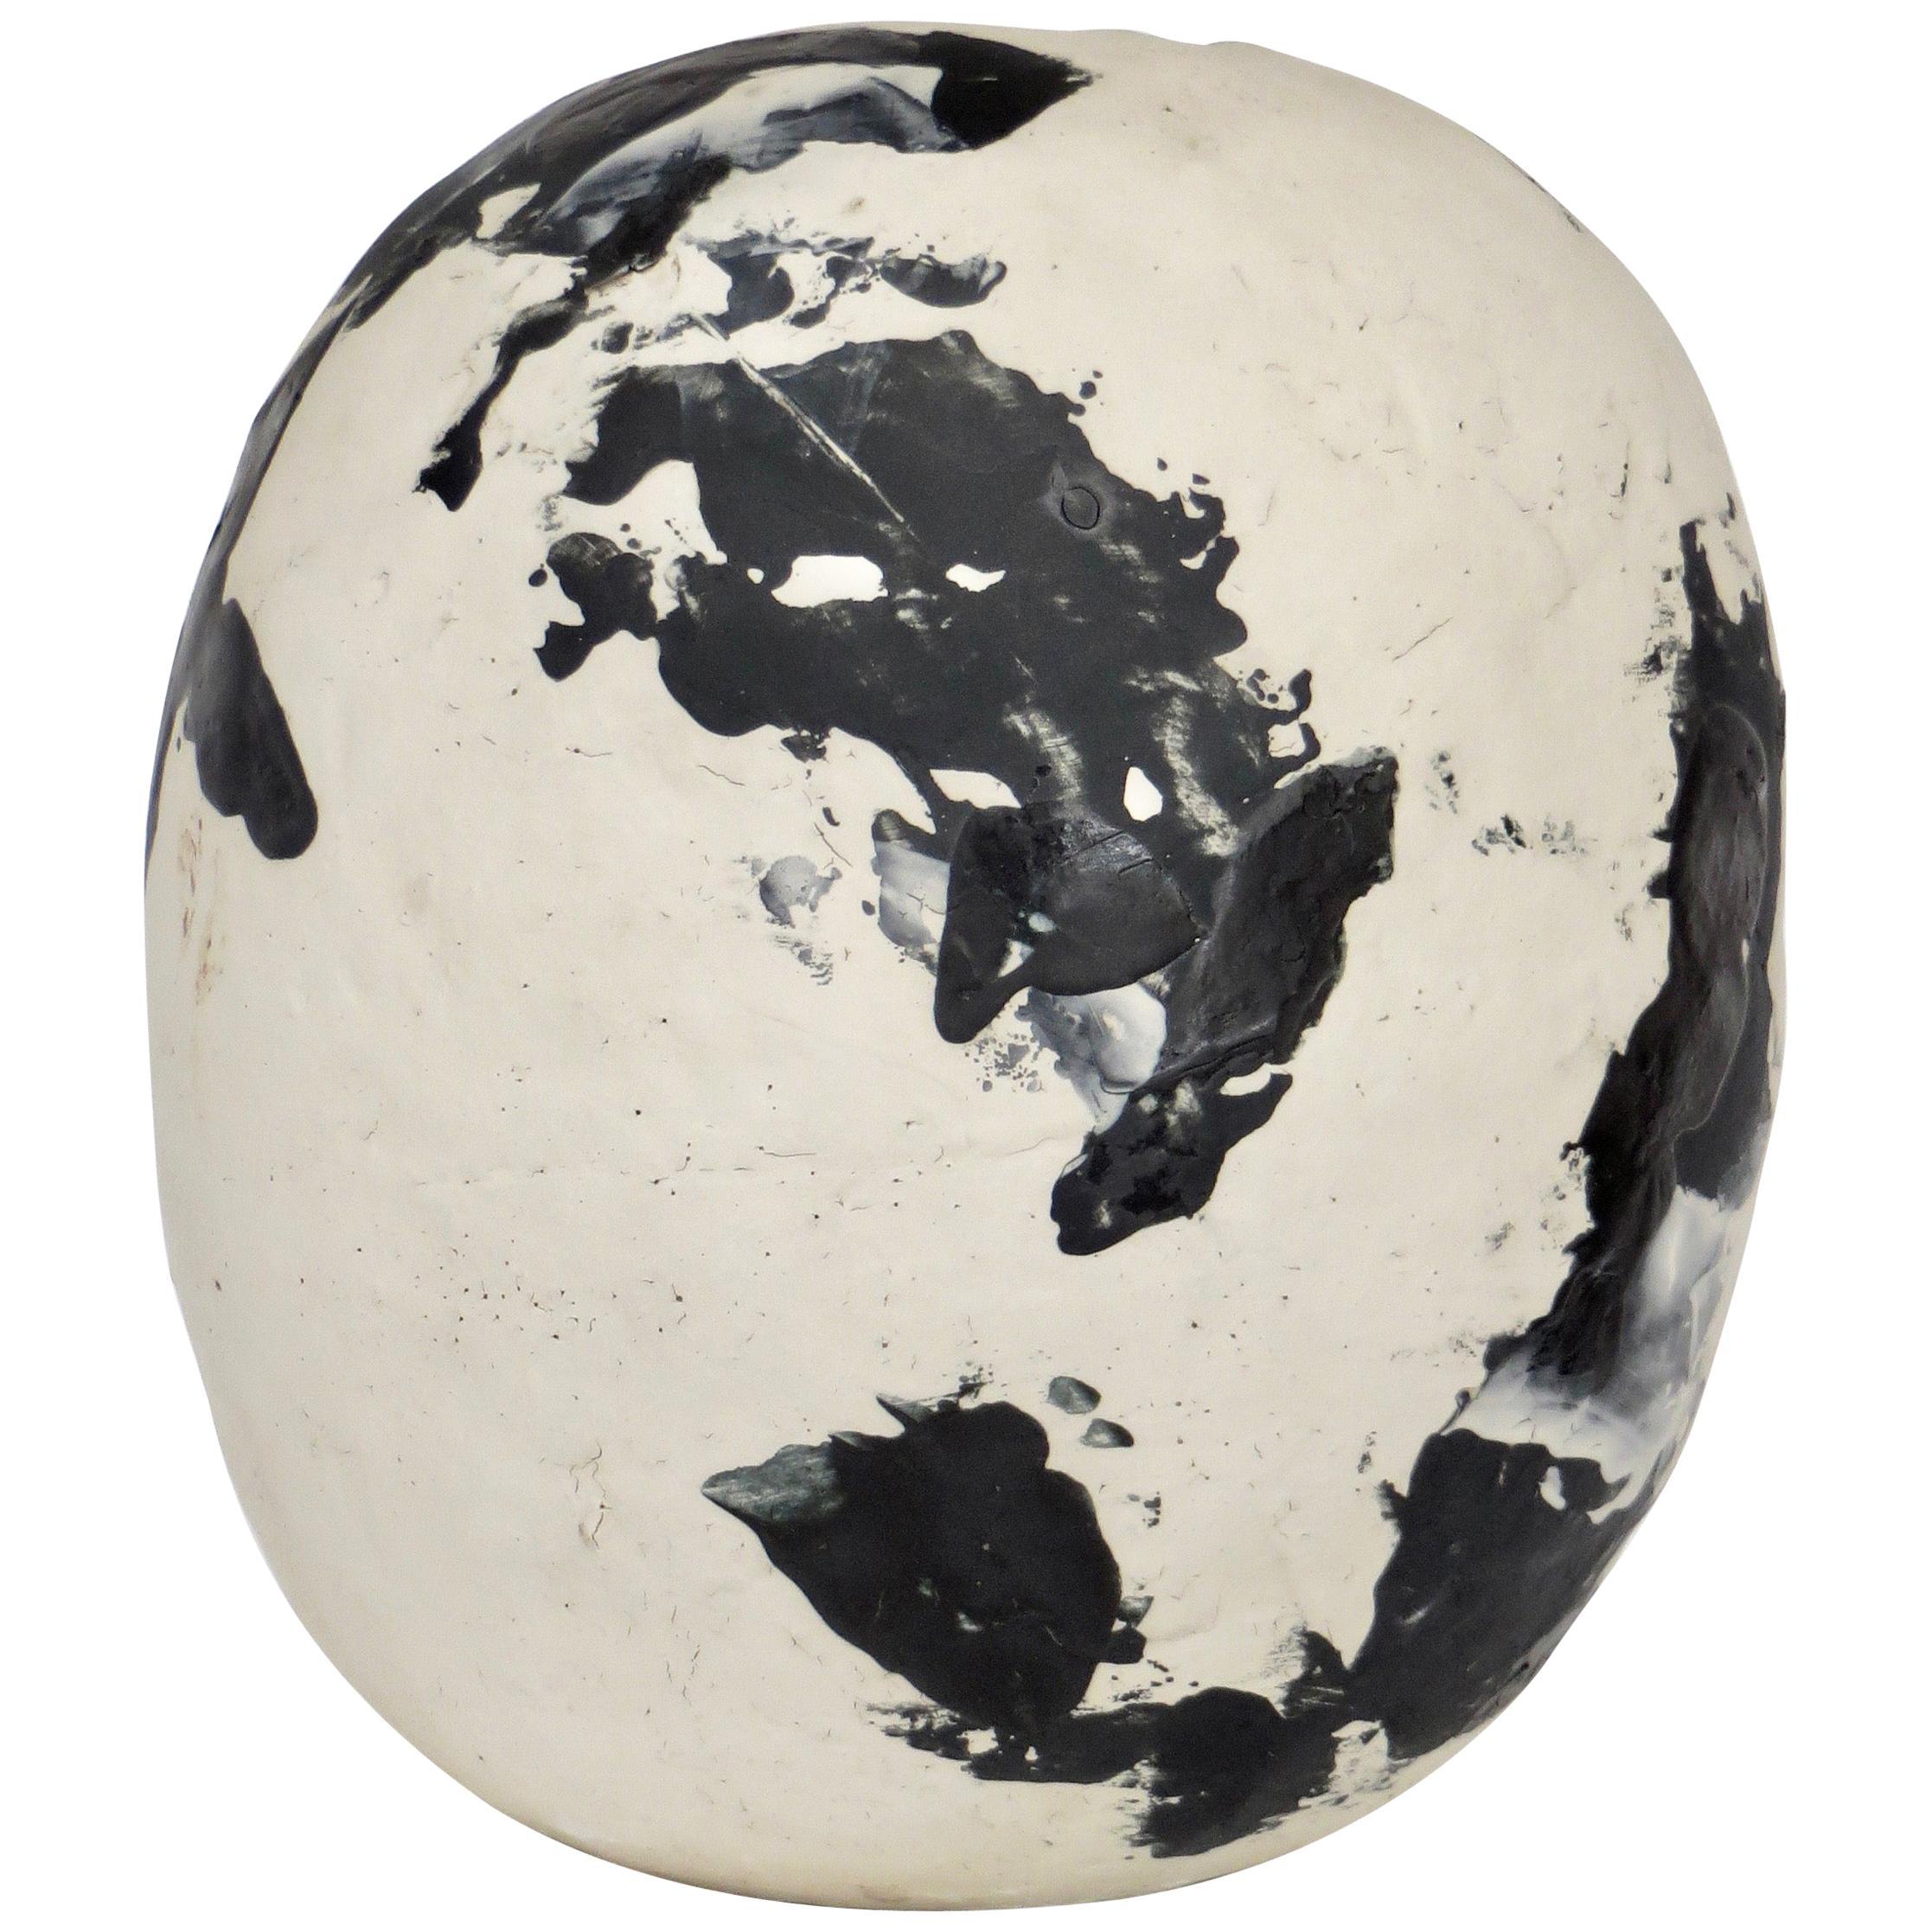 David Whitehead Ceramic Artist White and Black Wood Fired Ceramic Vase La Borne